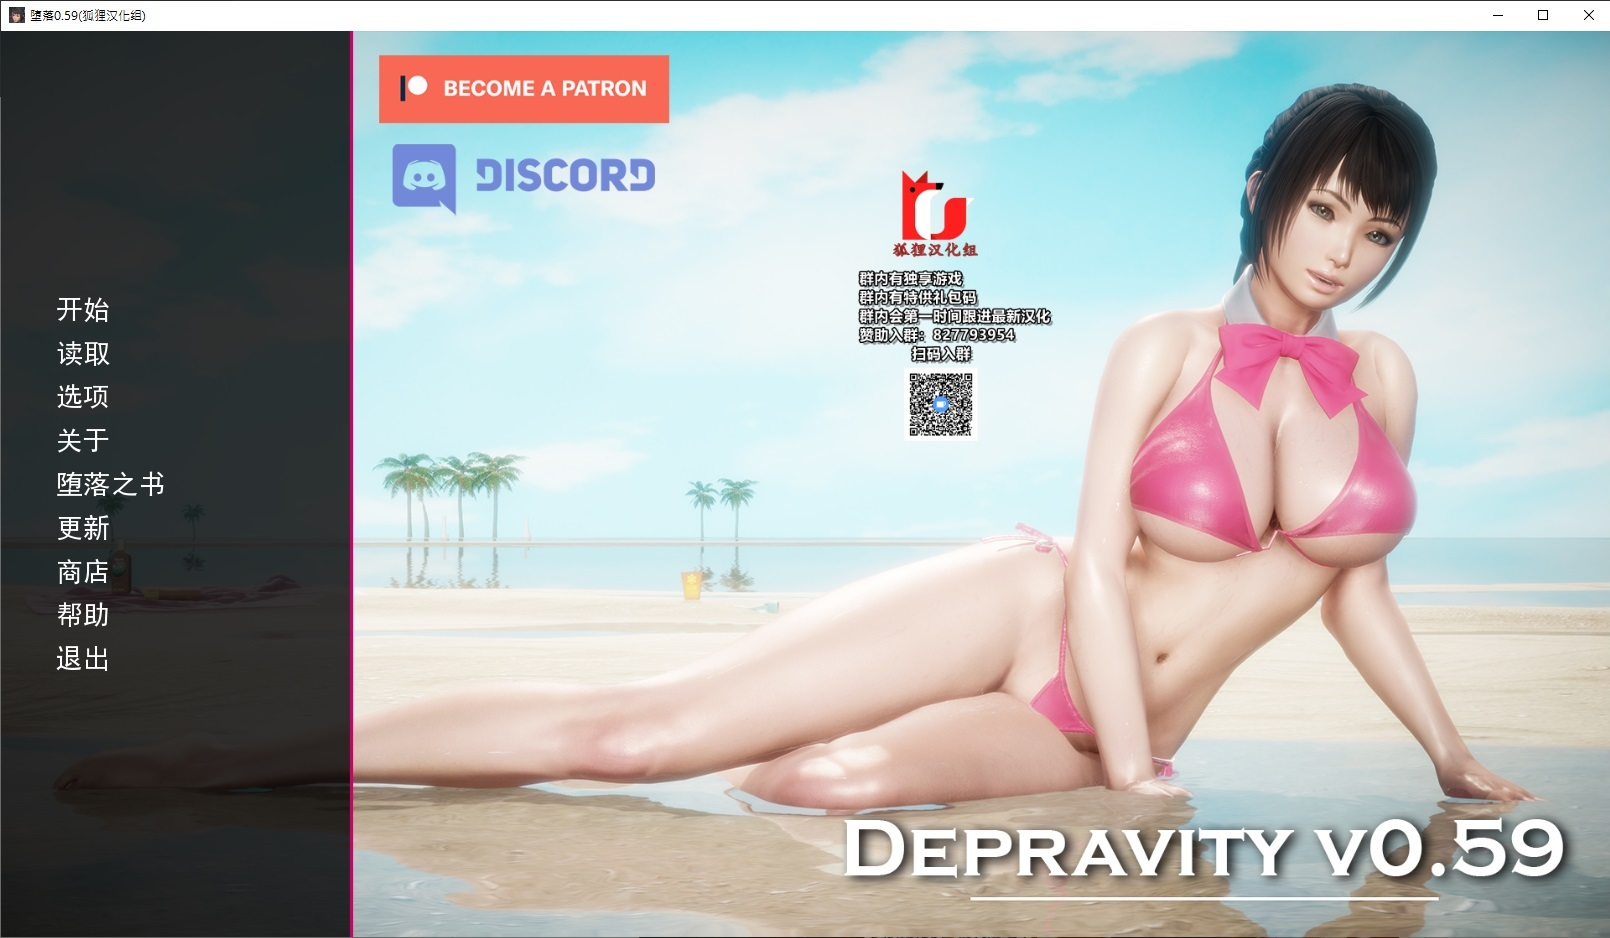 Depravity墮落Ver0.59 漢化精翻 PC+Android